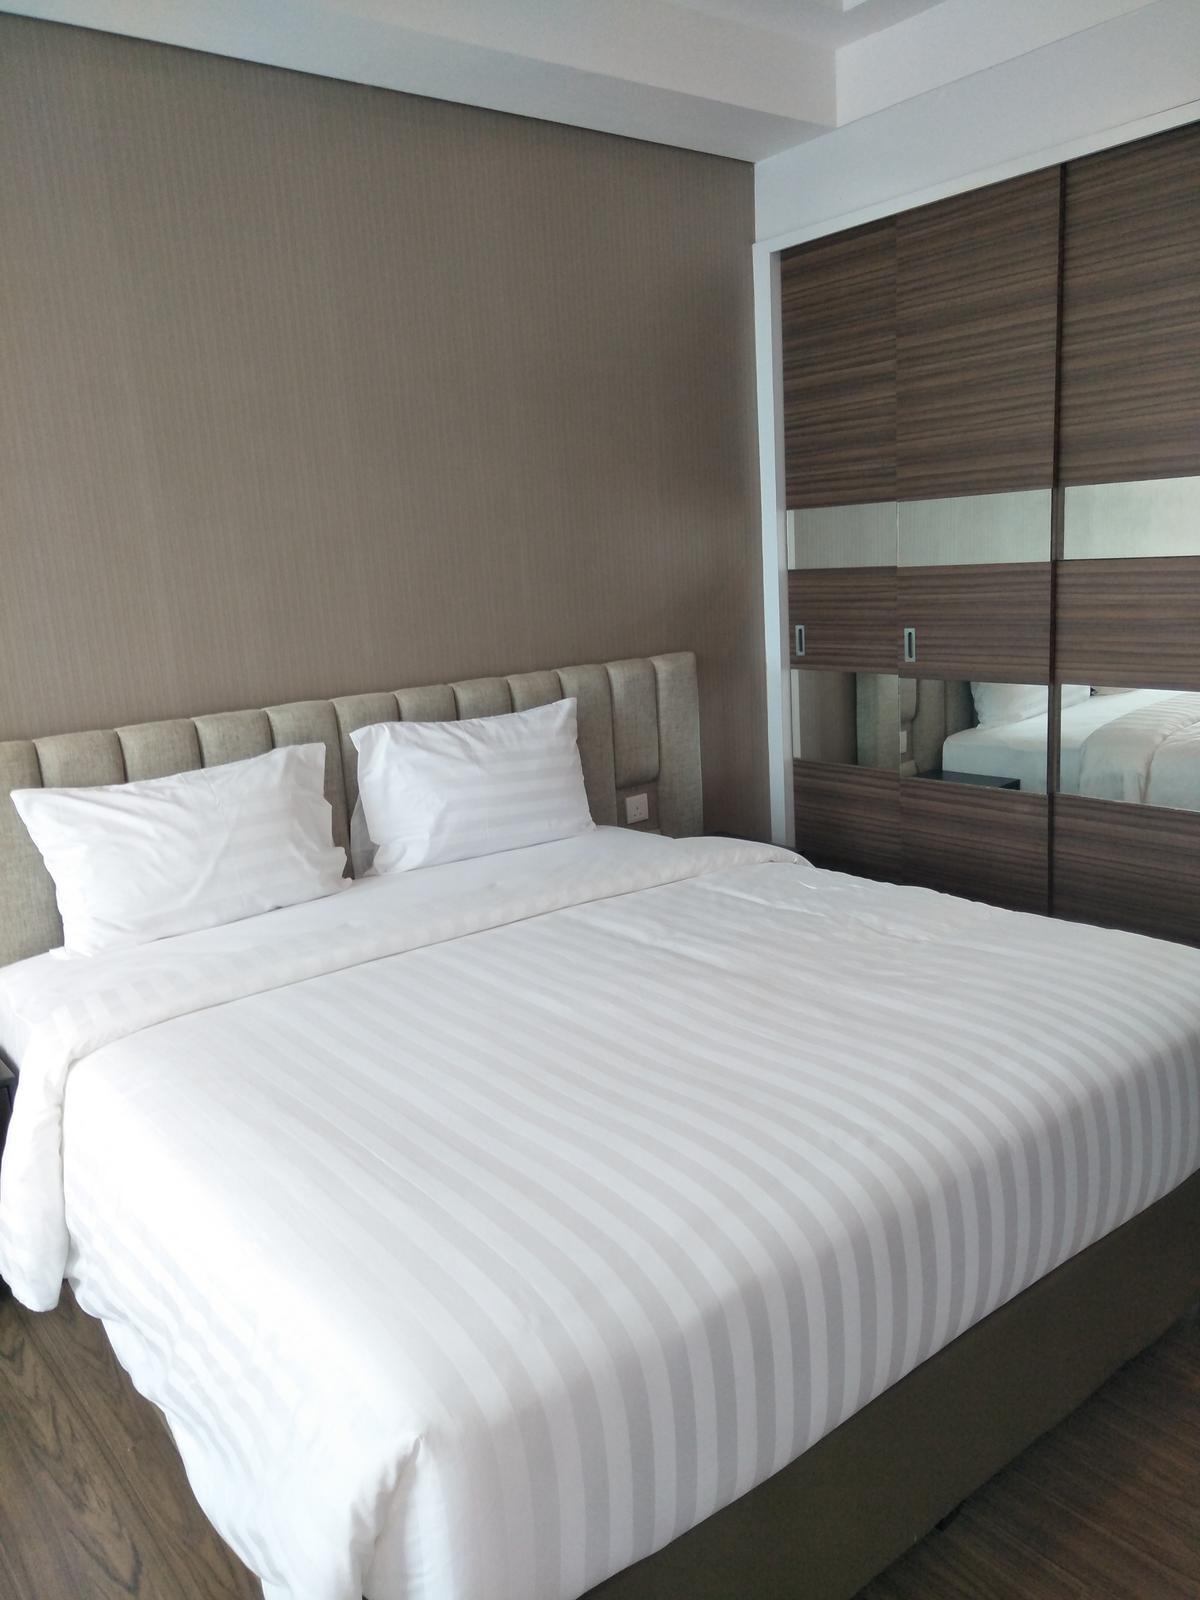 Apartemen Panbil - Studio Deluxe Double Room 9 @ Panbil Residence Apartement